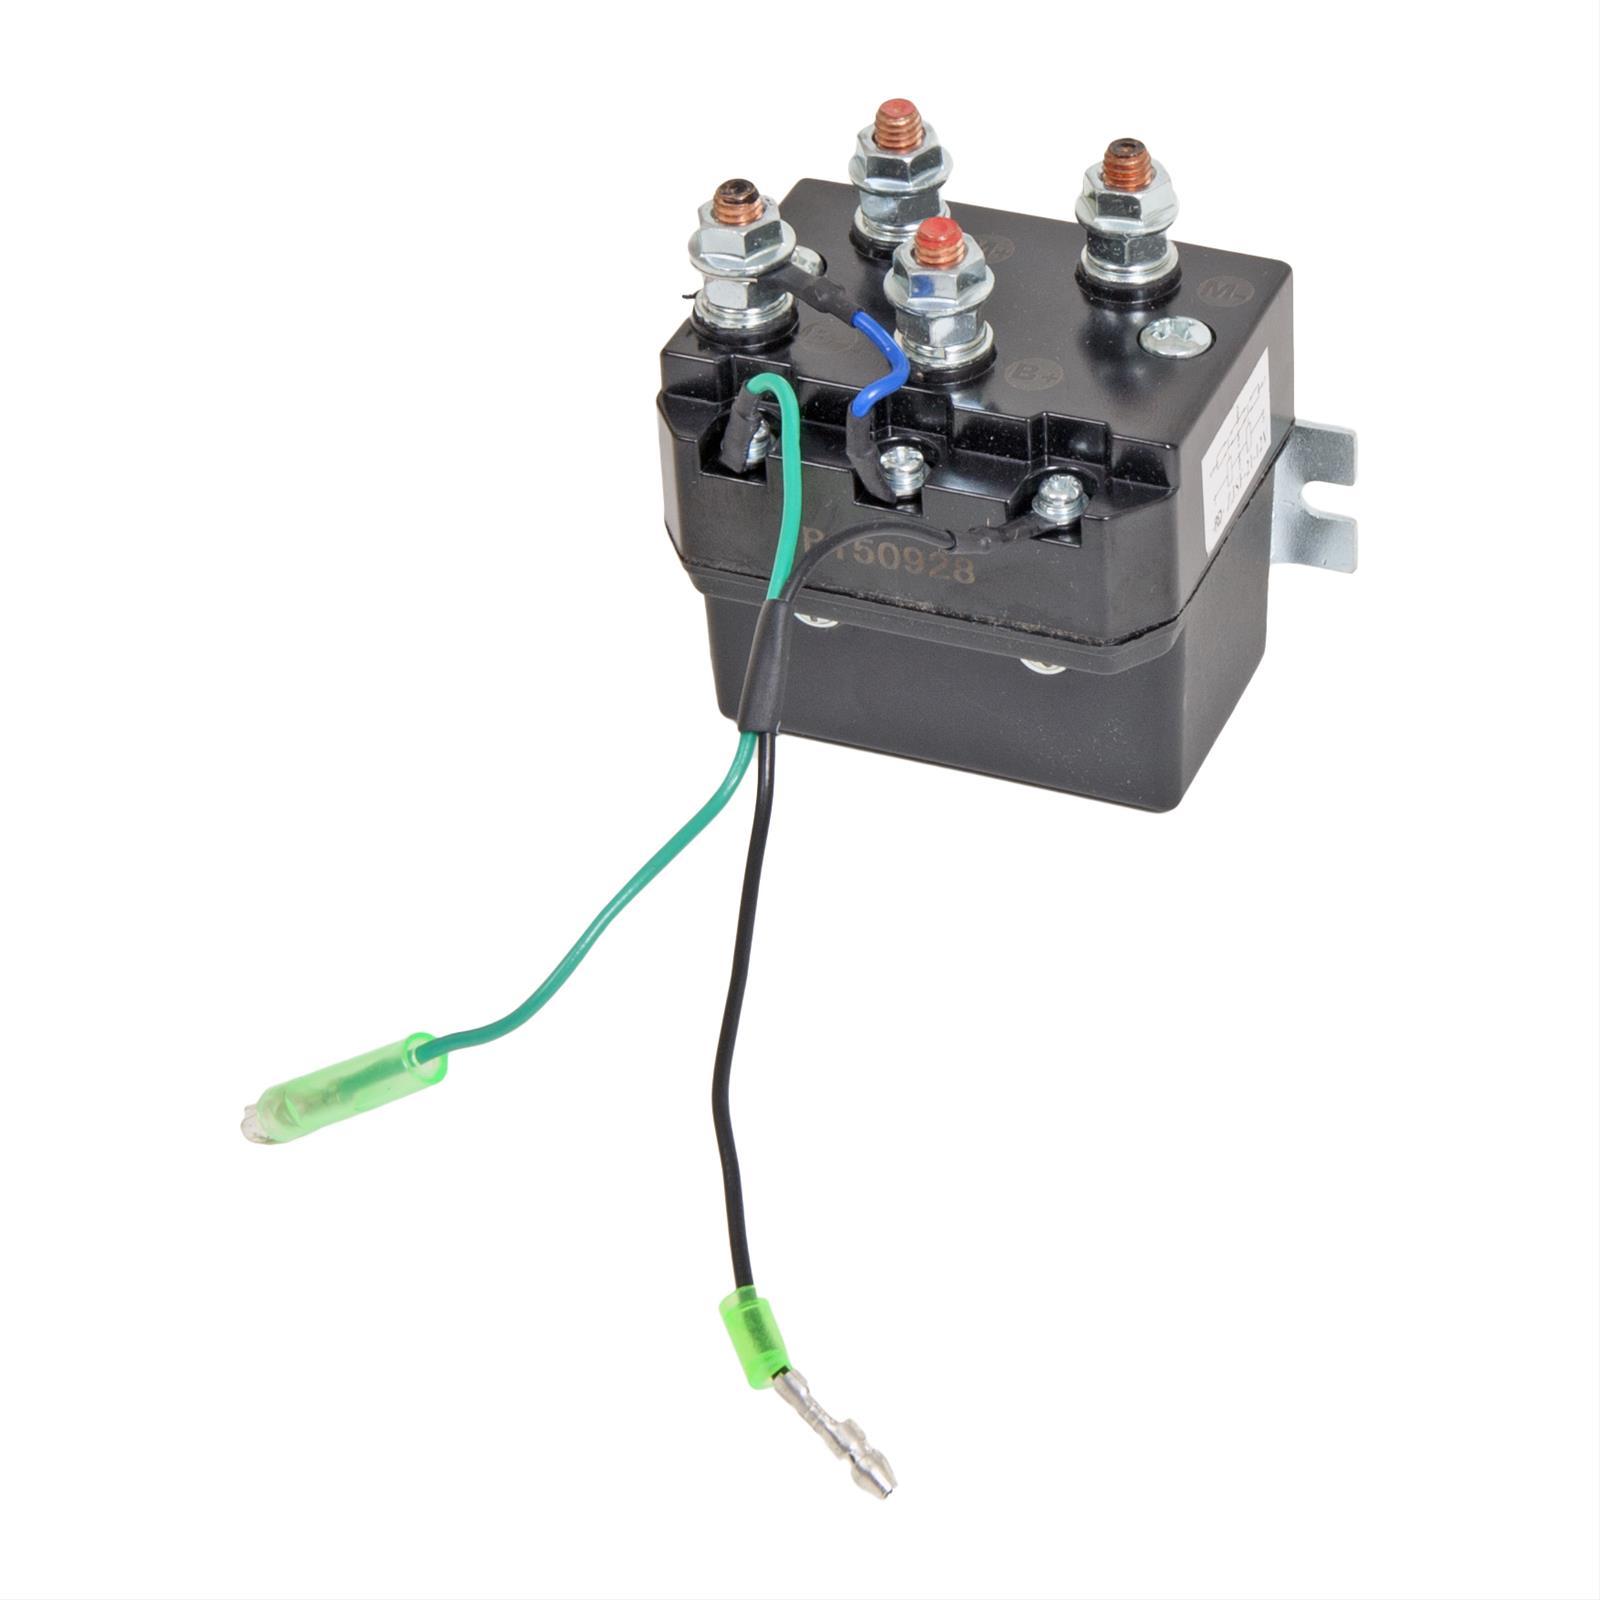 Smittybilt Atv Winch Wiring Diagram Data Diagrams Warn M12000 Remote Control Solenoid